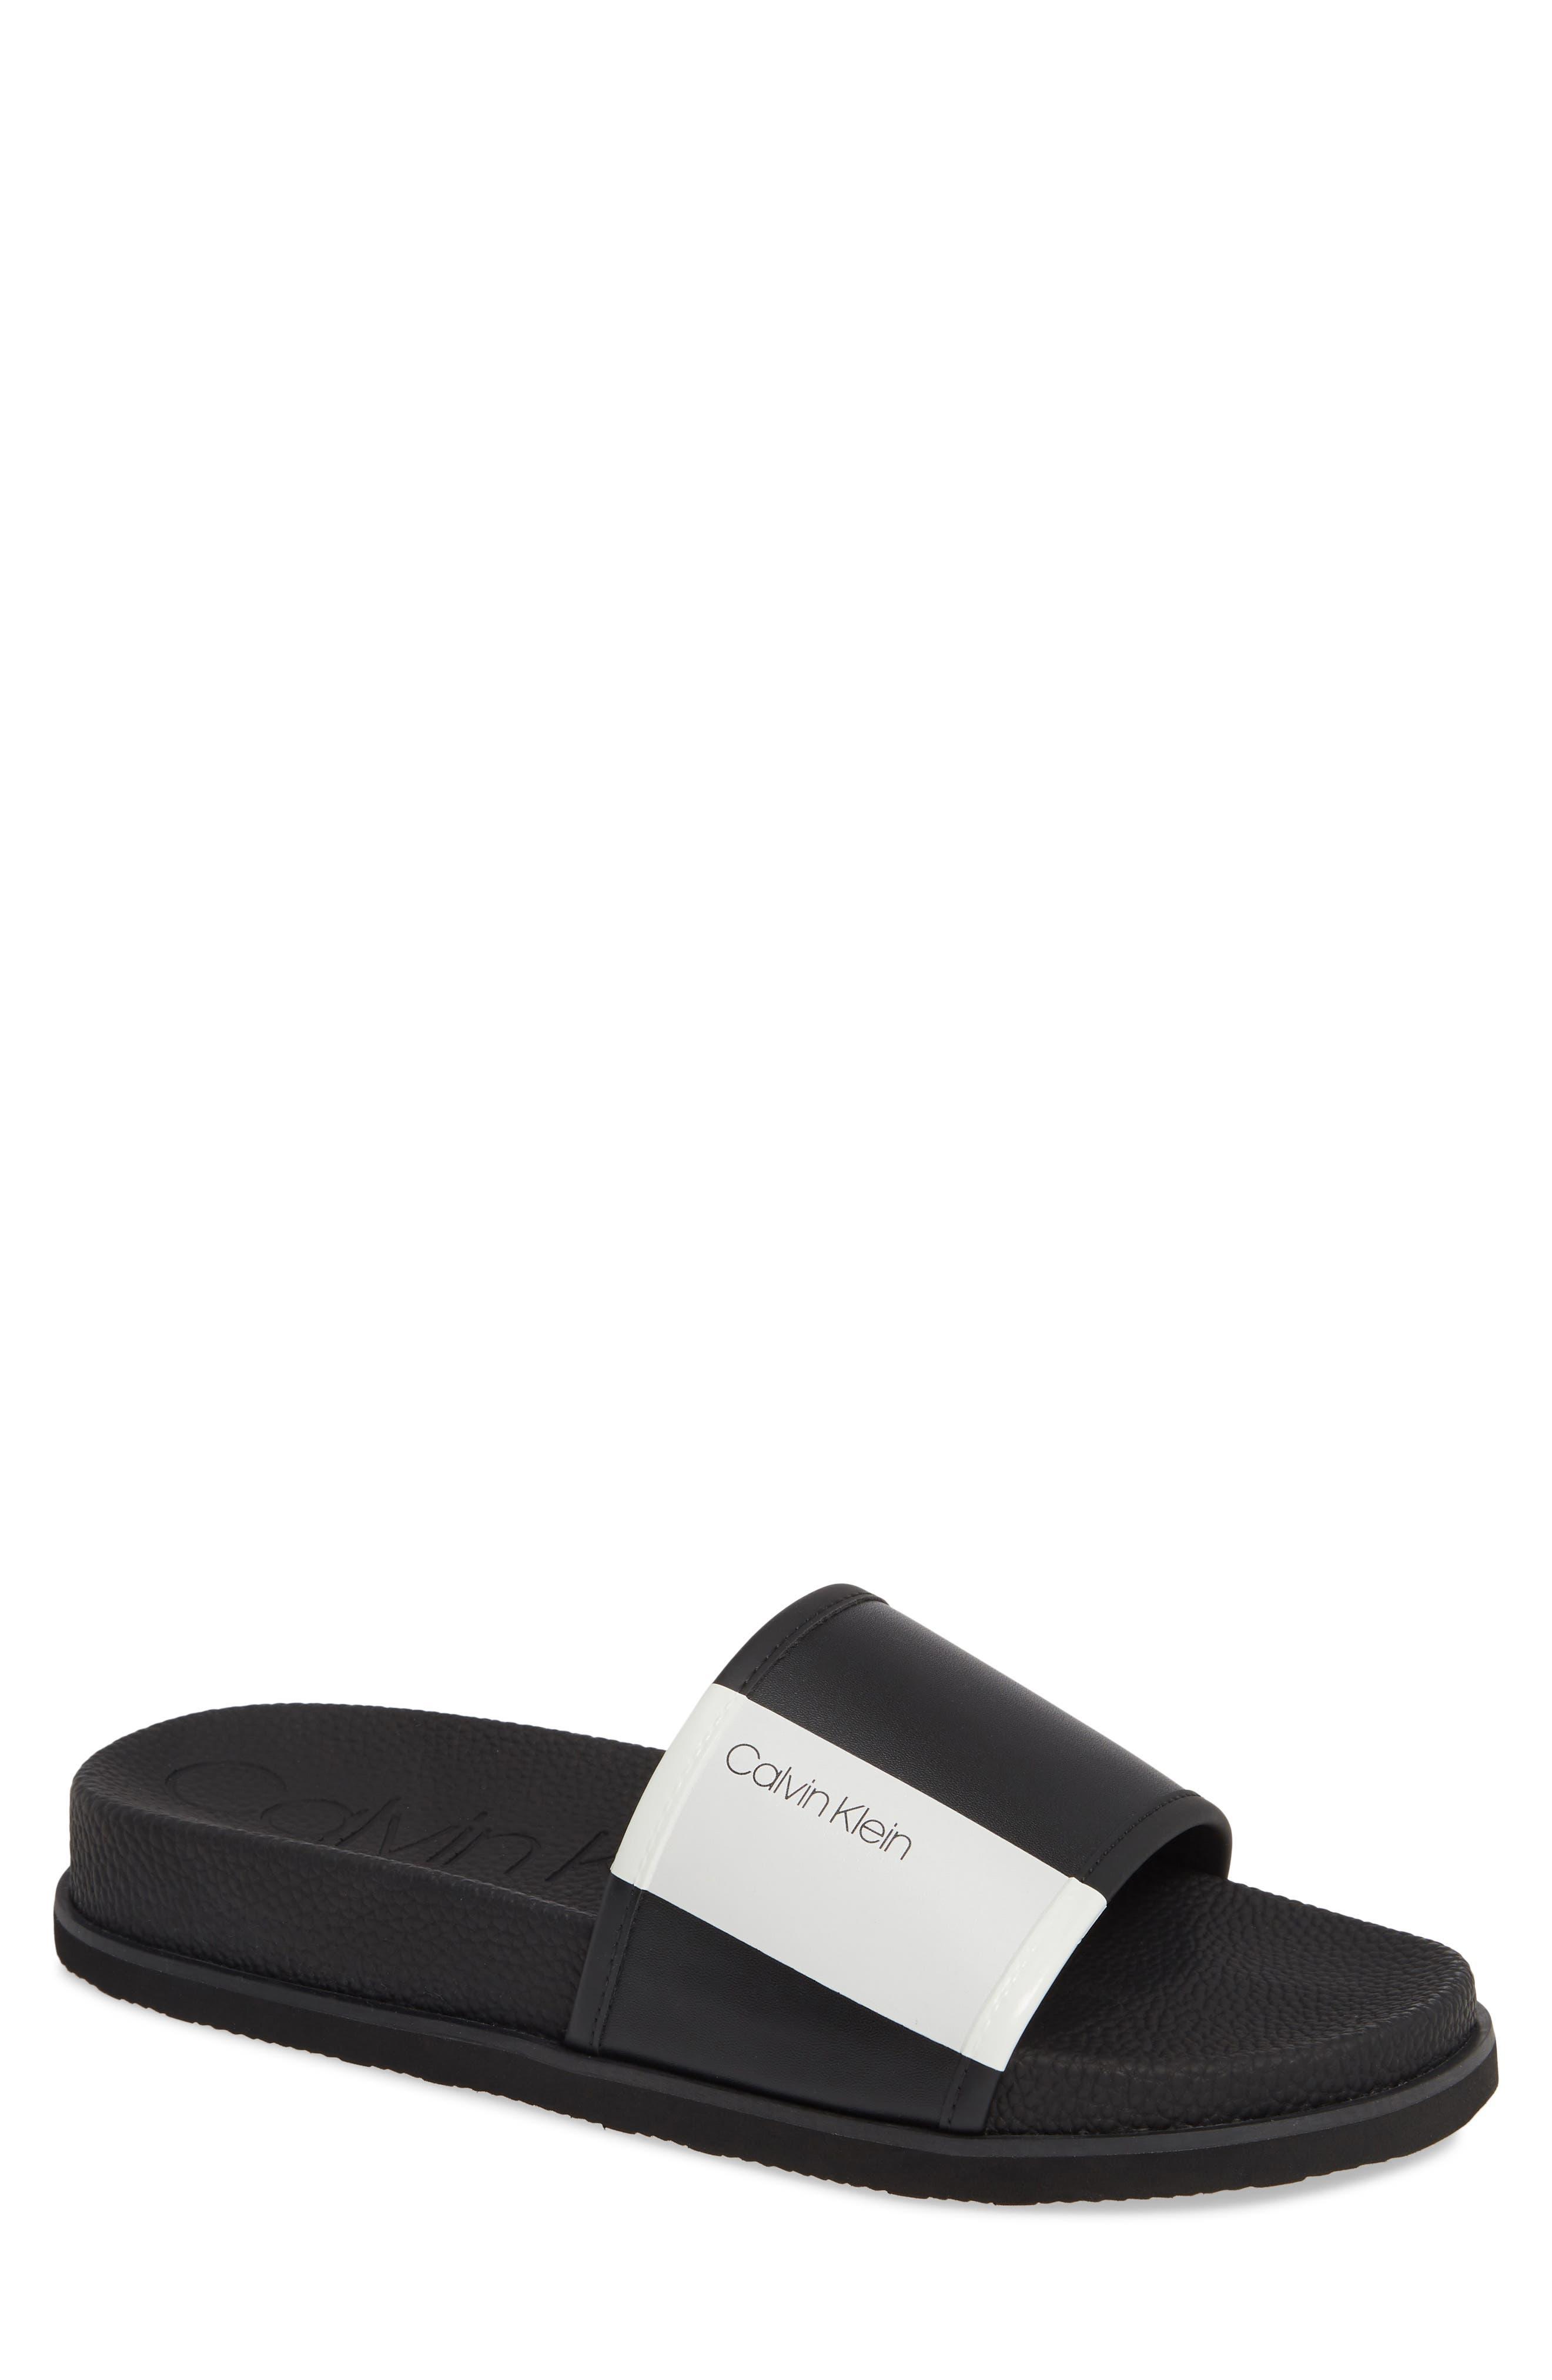 Mackee Slide Sandal, Main, color, BLACK